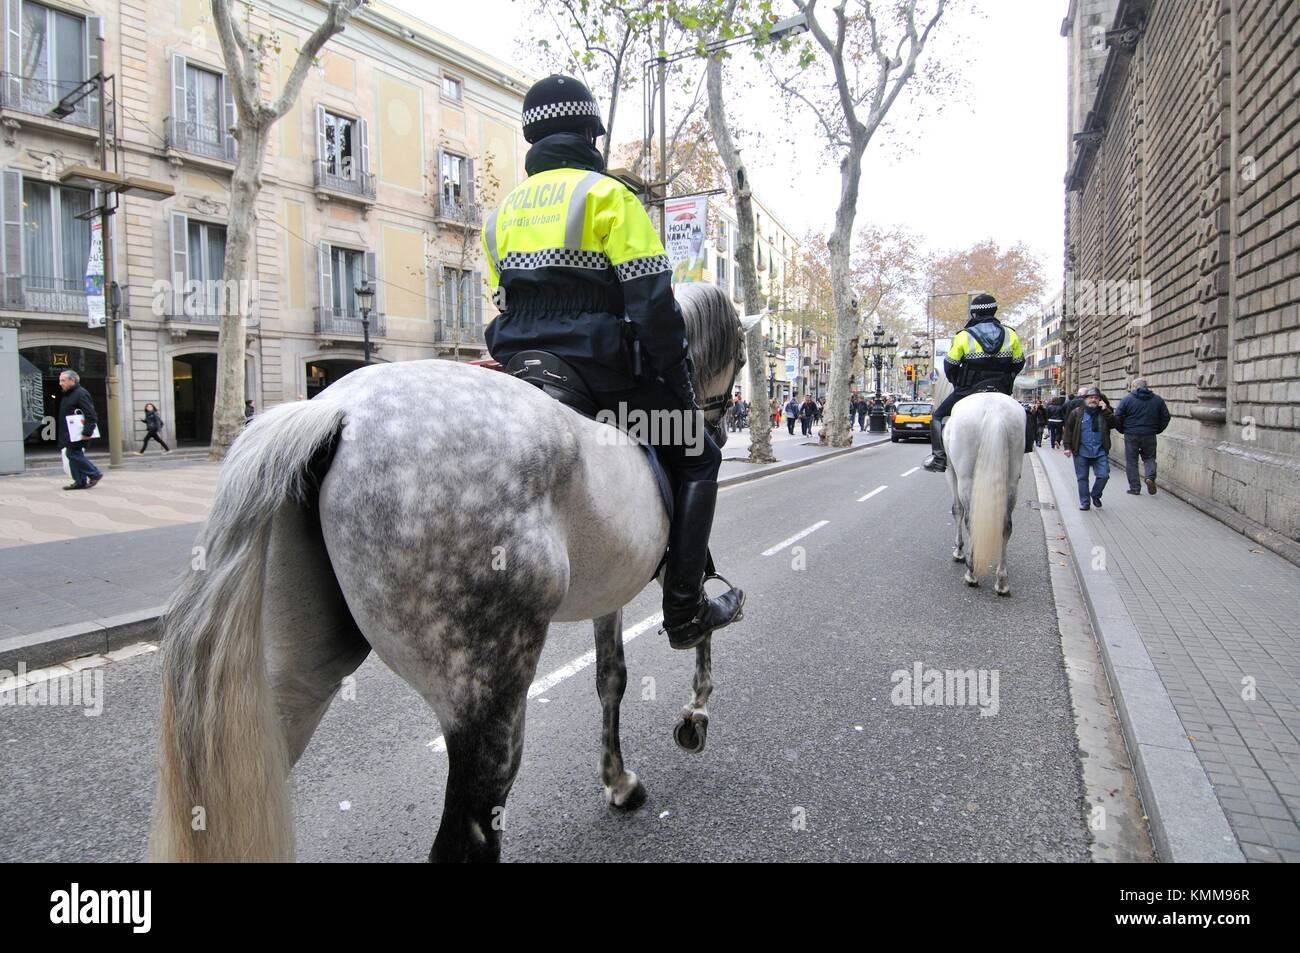 Guardia urbana, Urban guard, Municipal police on horseback. La Rambla. Barcelona, Catalonia, Spain. - Stock Image